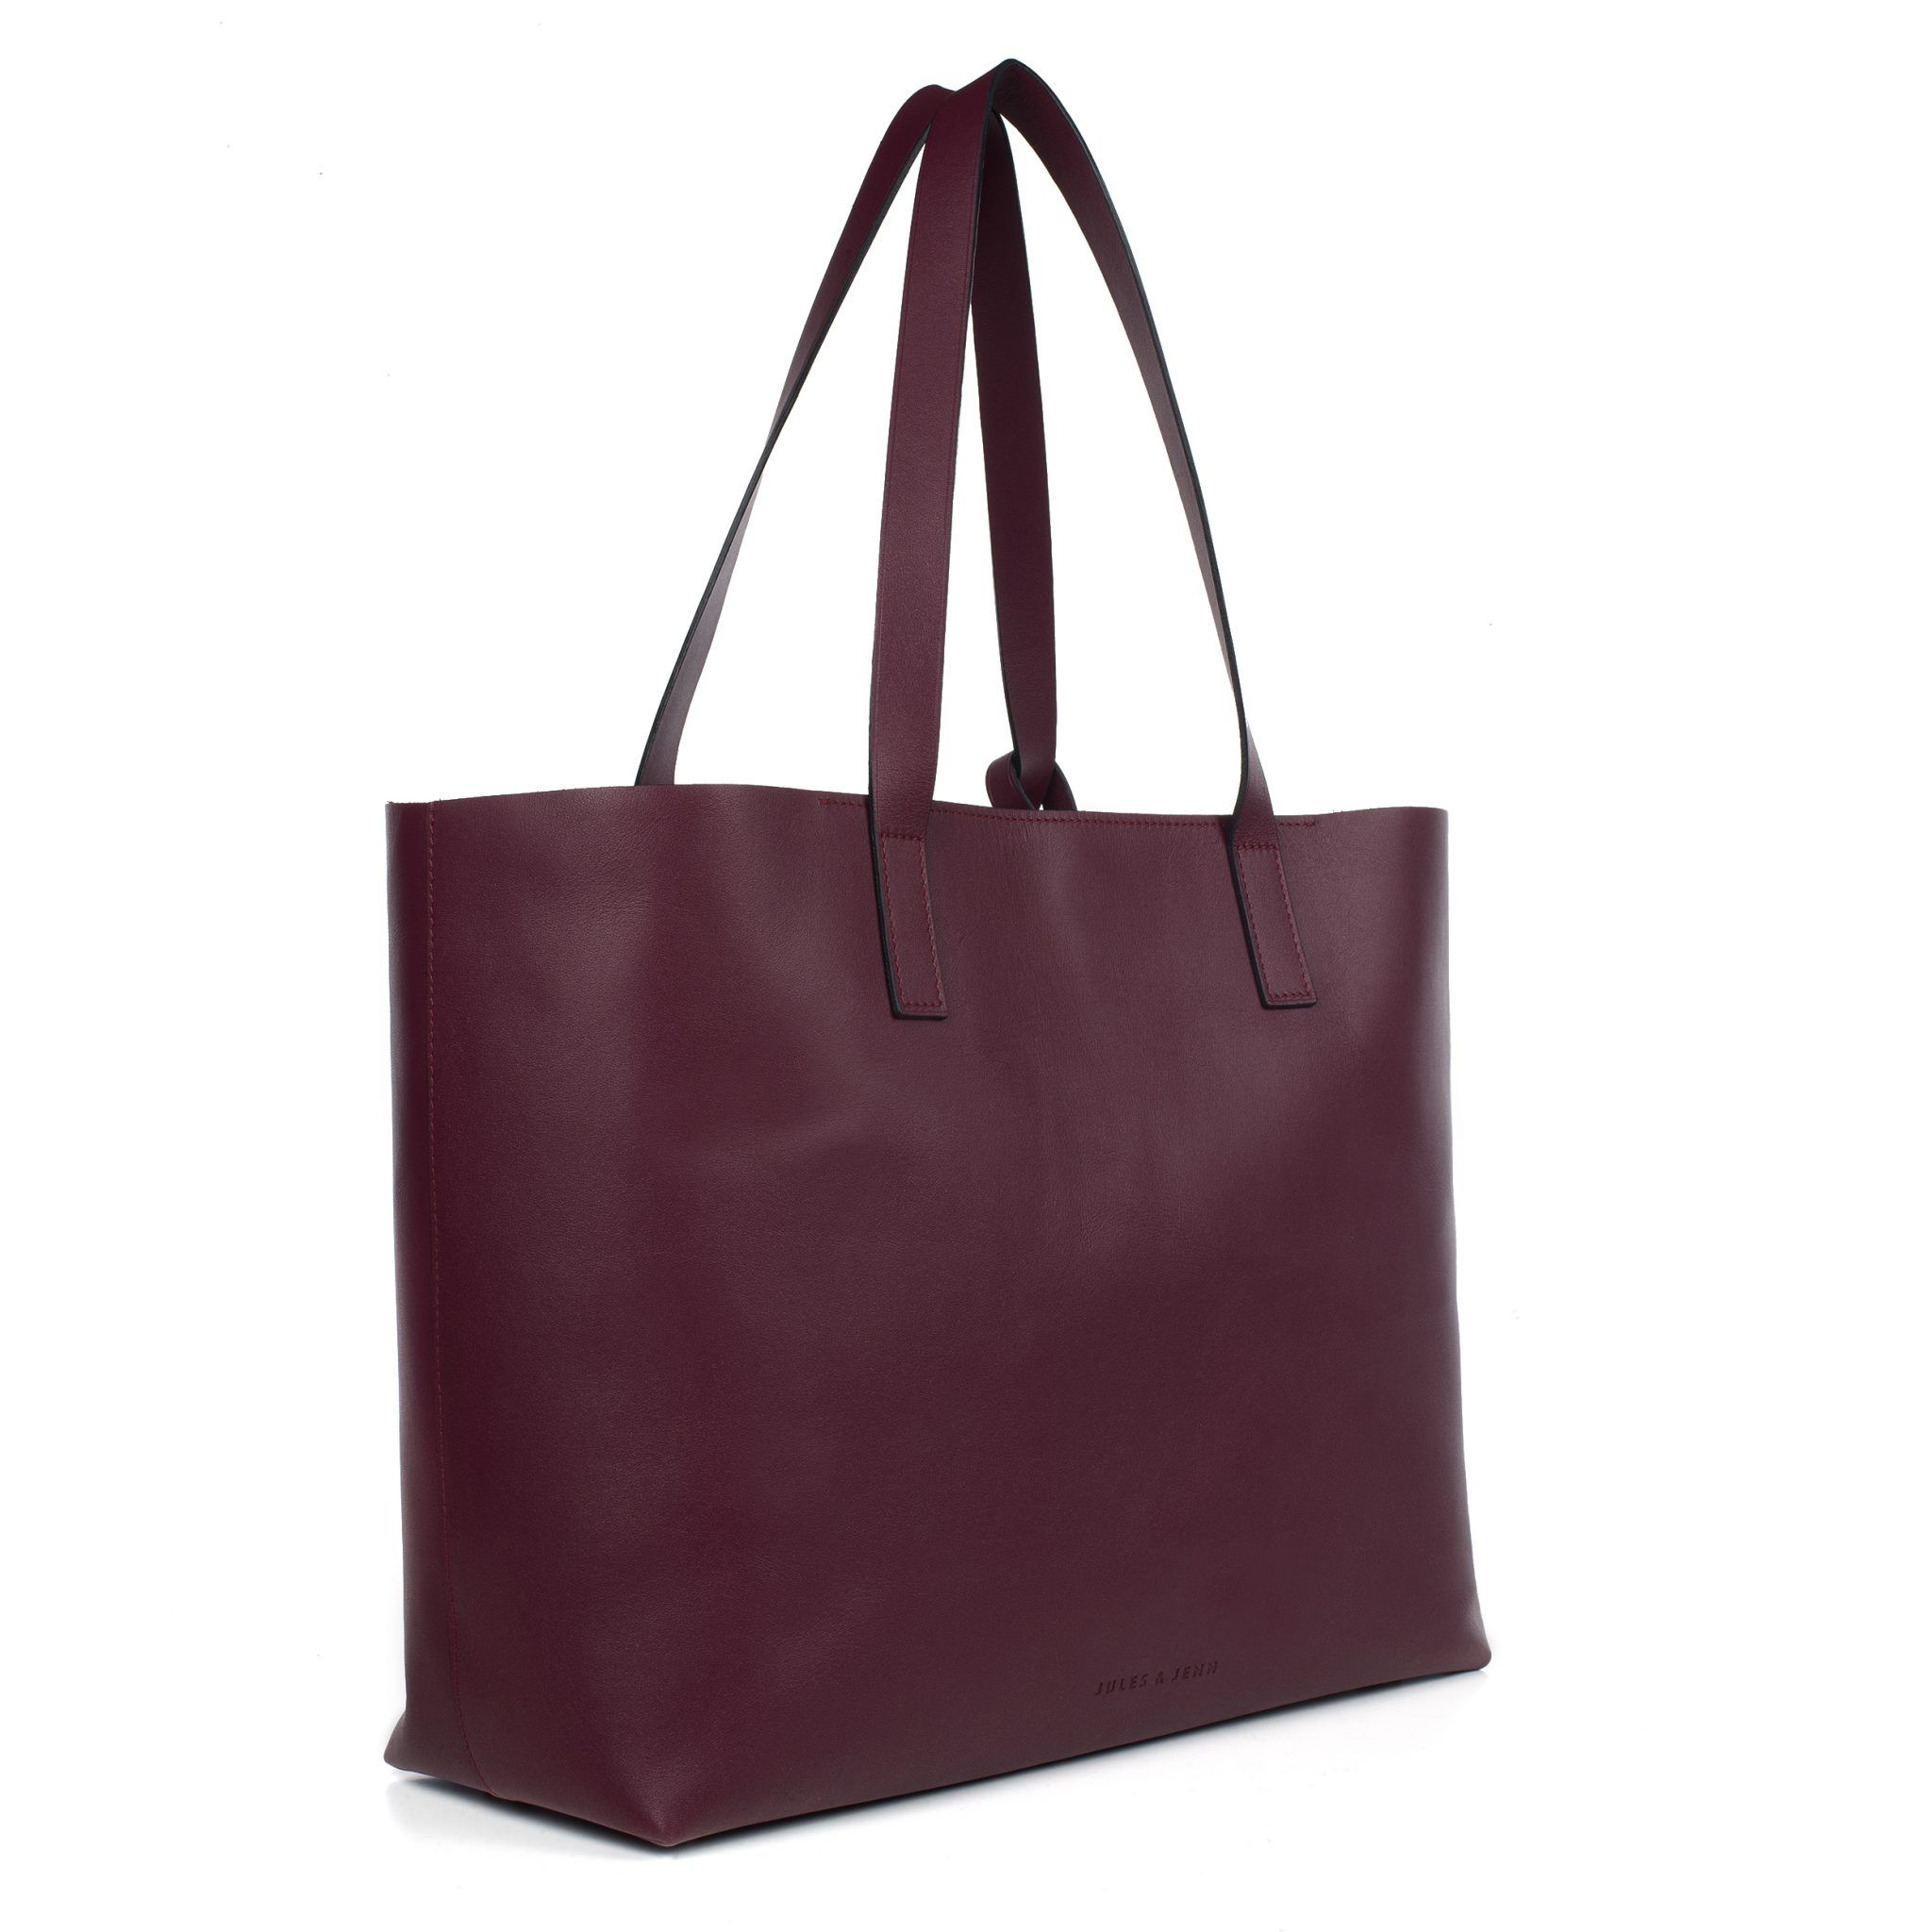 sac a main bordeaux femme